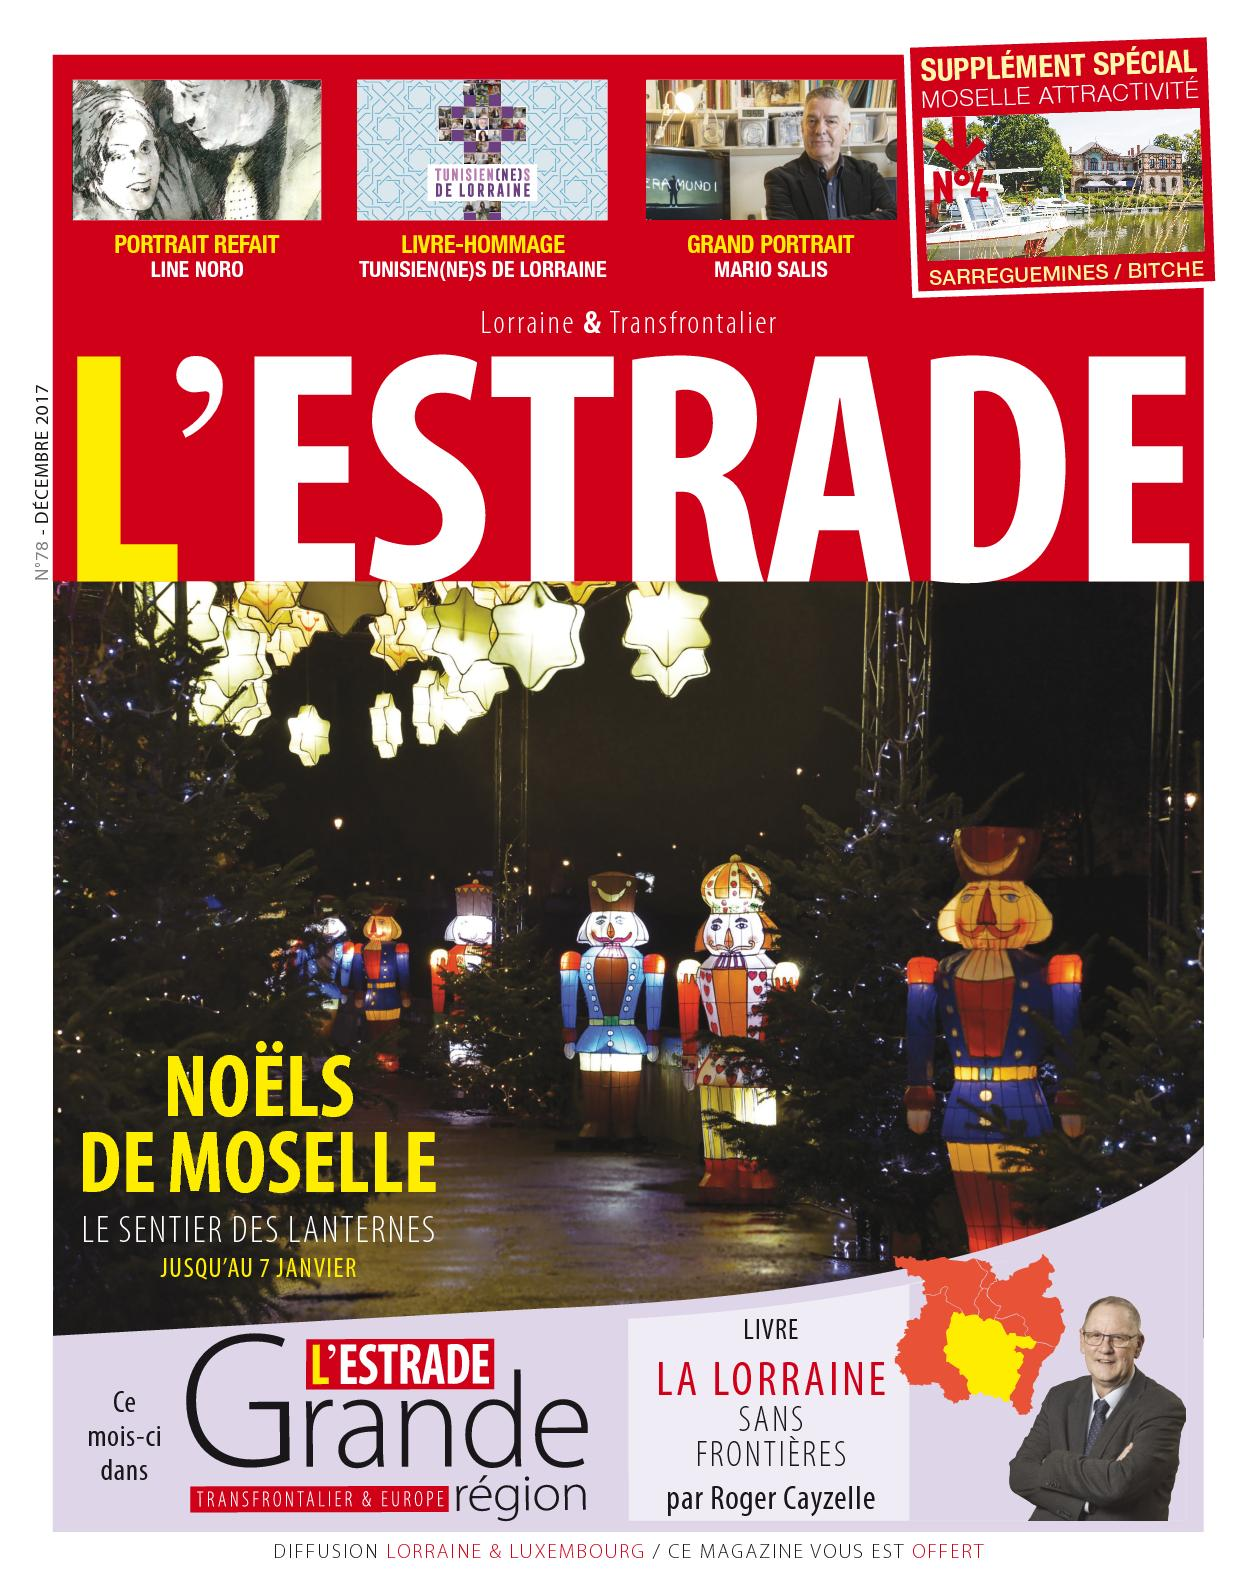 068c44cdc1d Calaméo - L Estrade N°78 Décembre 2017